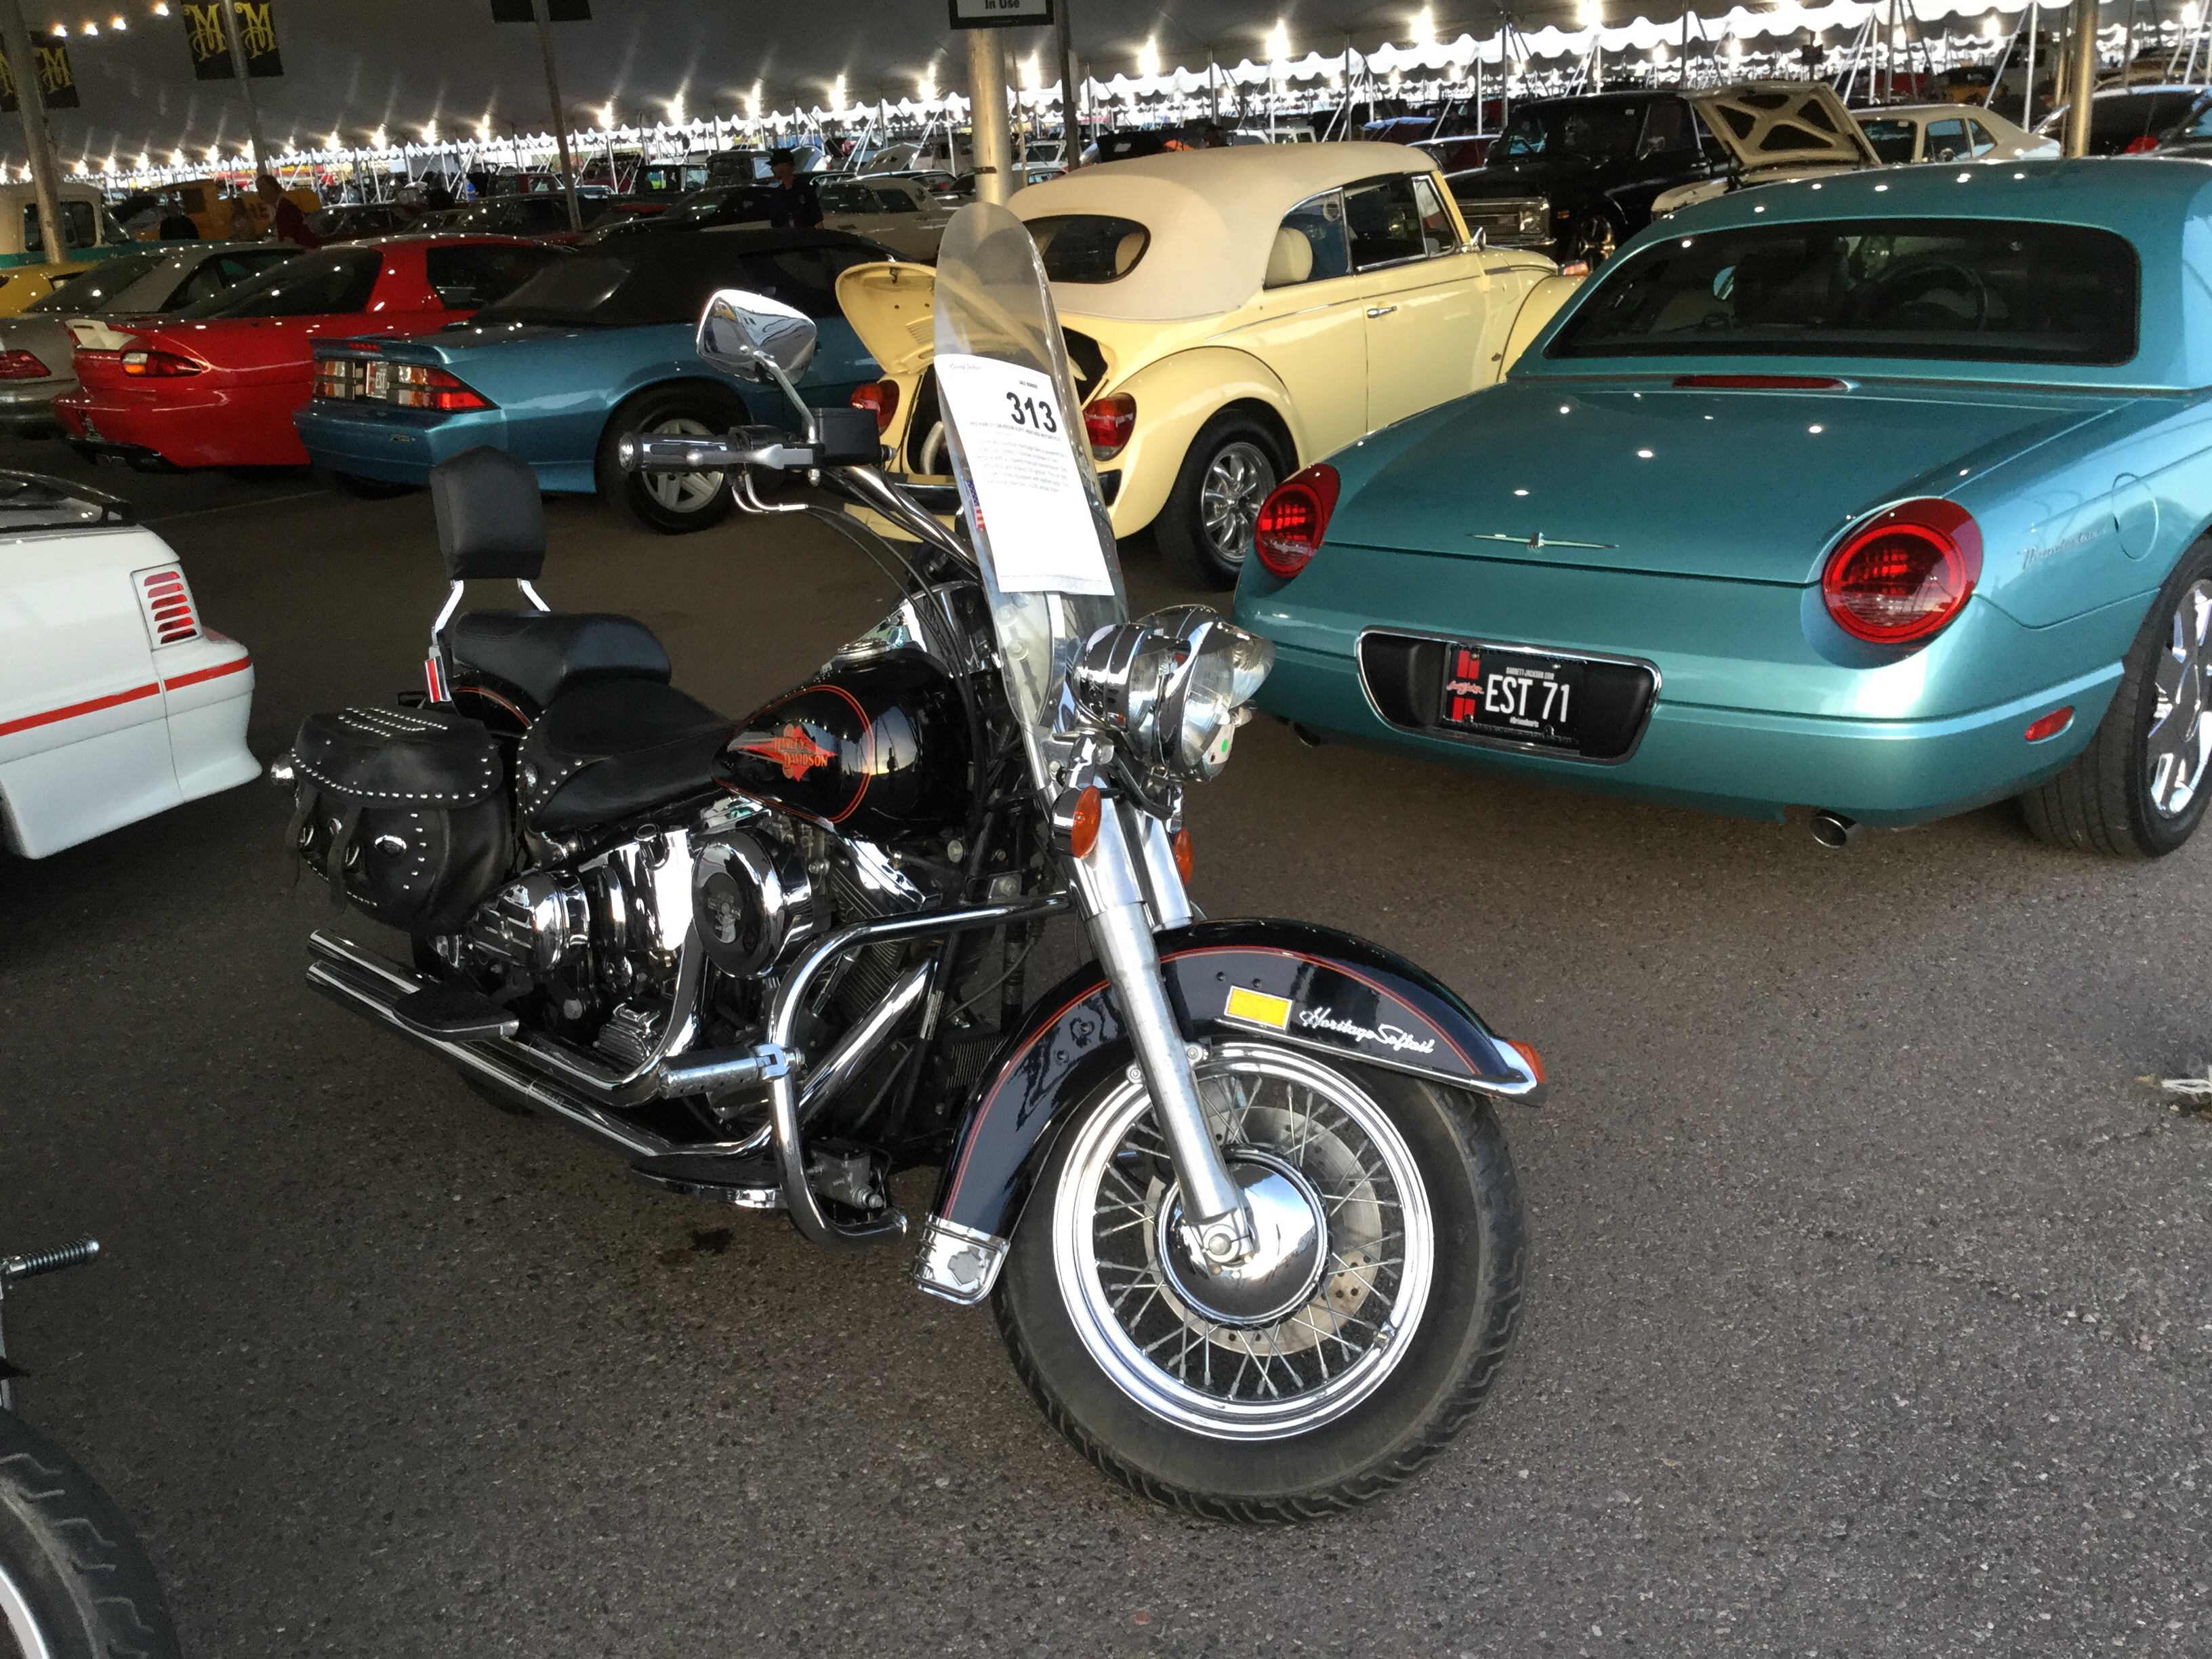 1992 Harley Davidson FLSTC Heritage Softail Custom Motorcycle